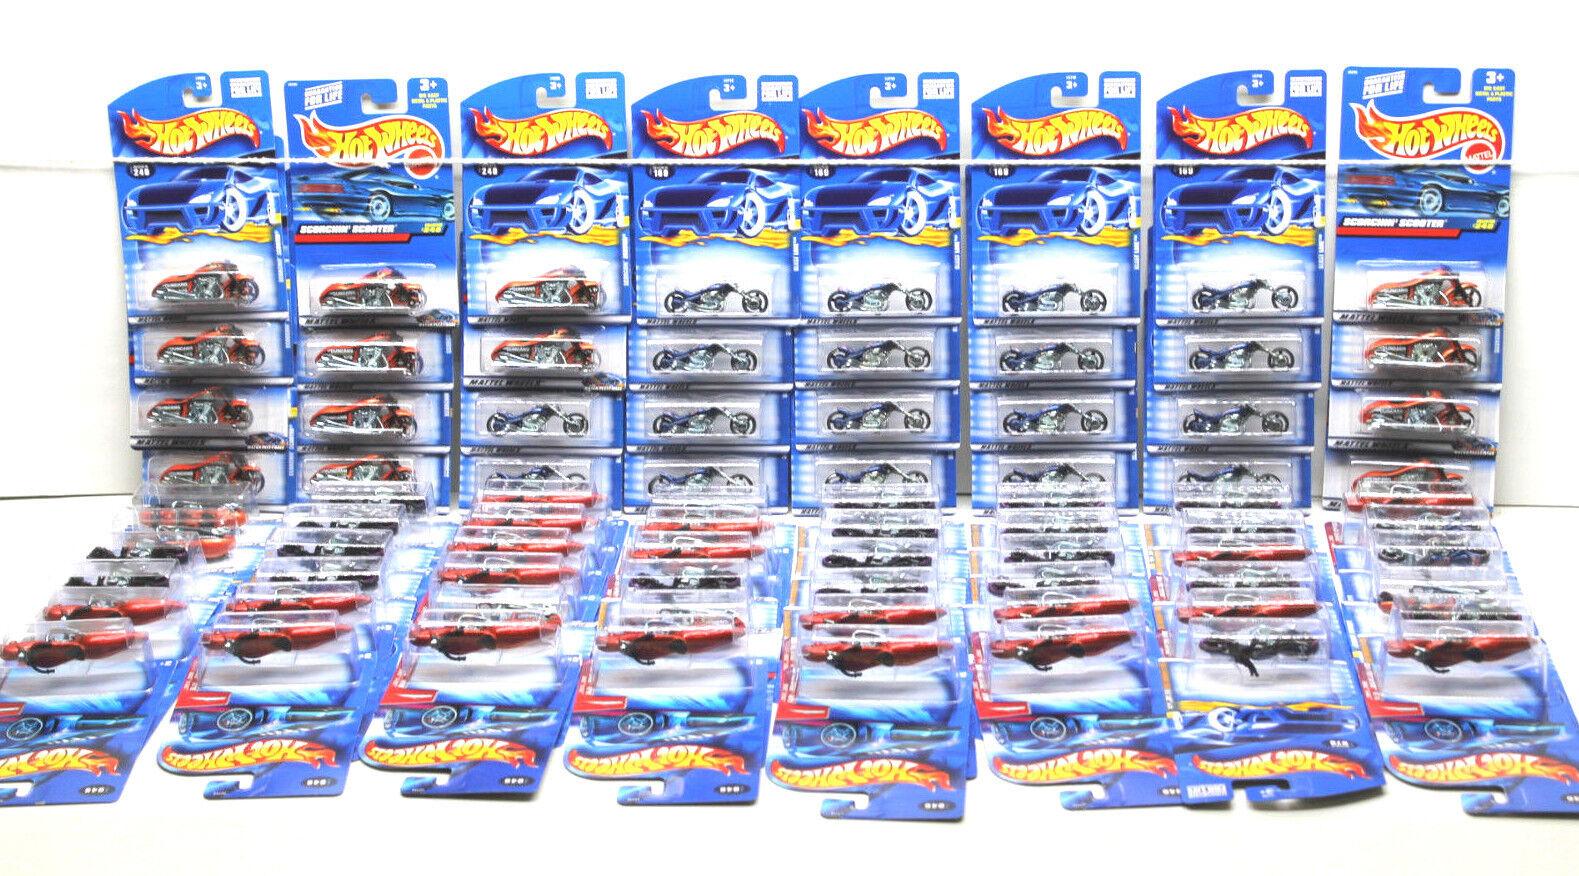 80 pc Hot Wheels Die Cast Motorcycle Scooter Lot Mattel 1999-2003 NOC Blast Lane